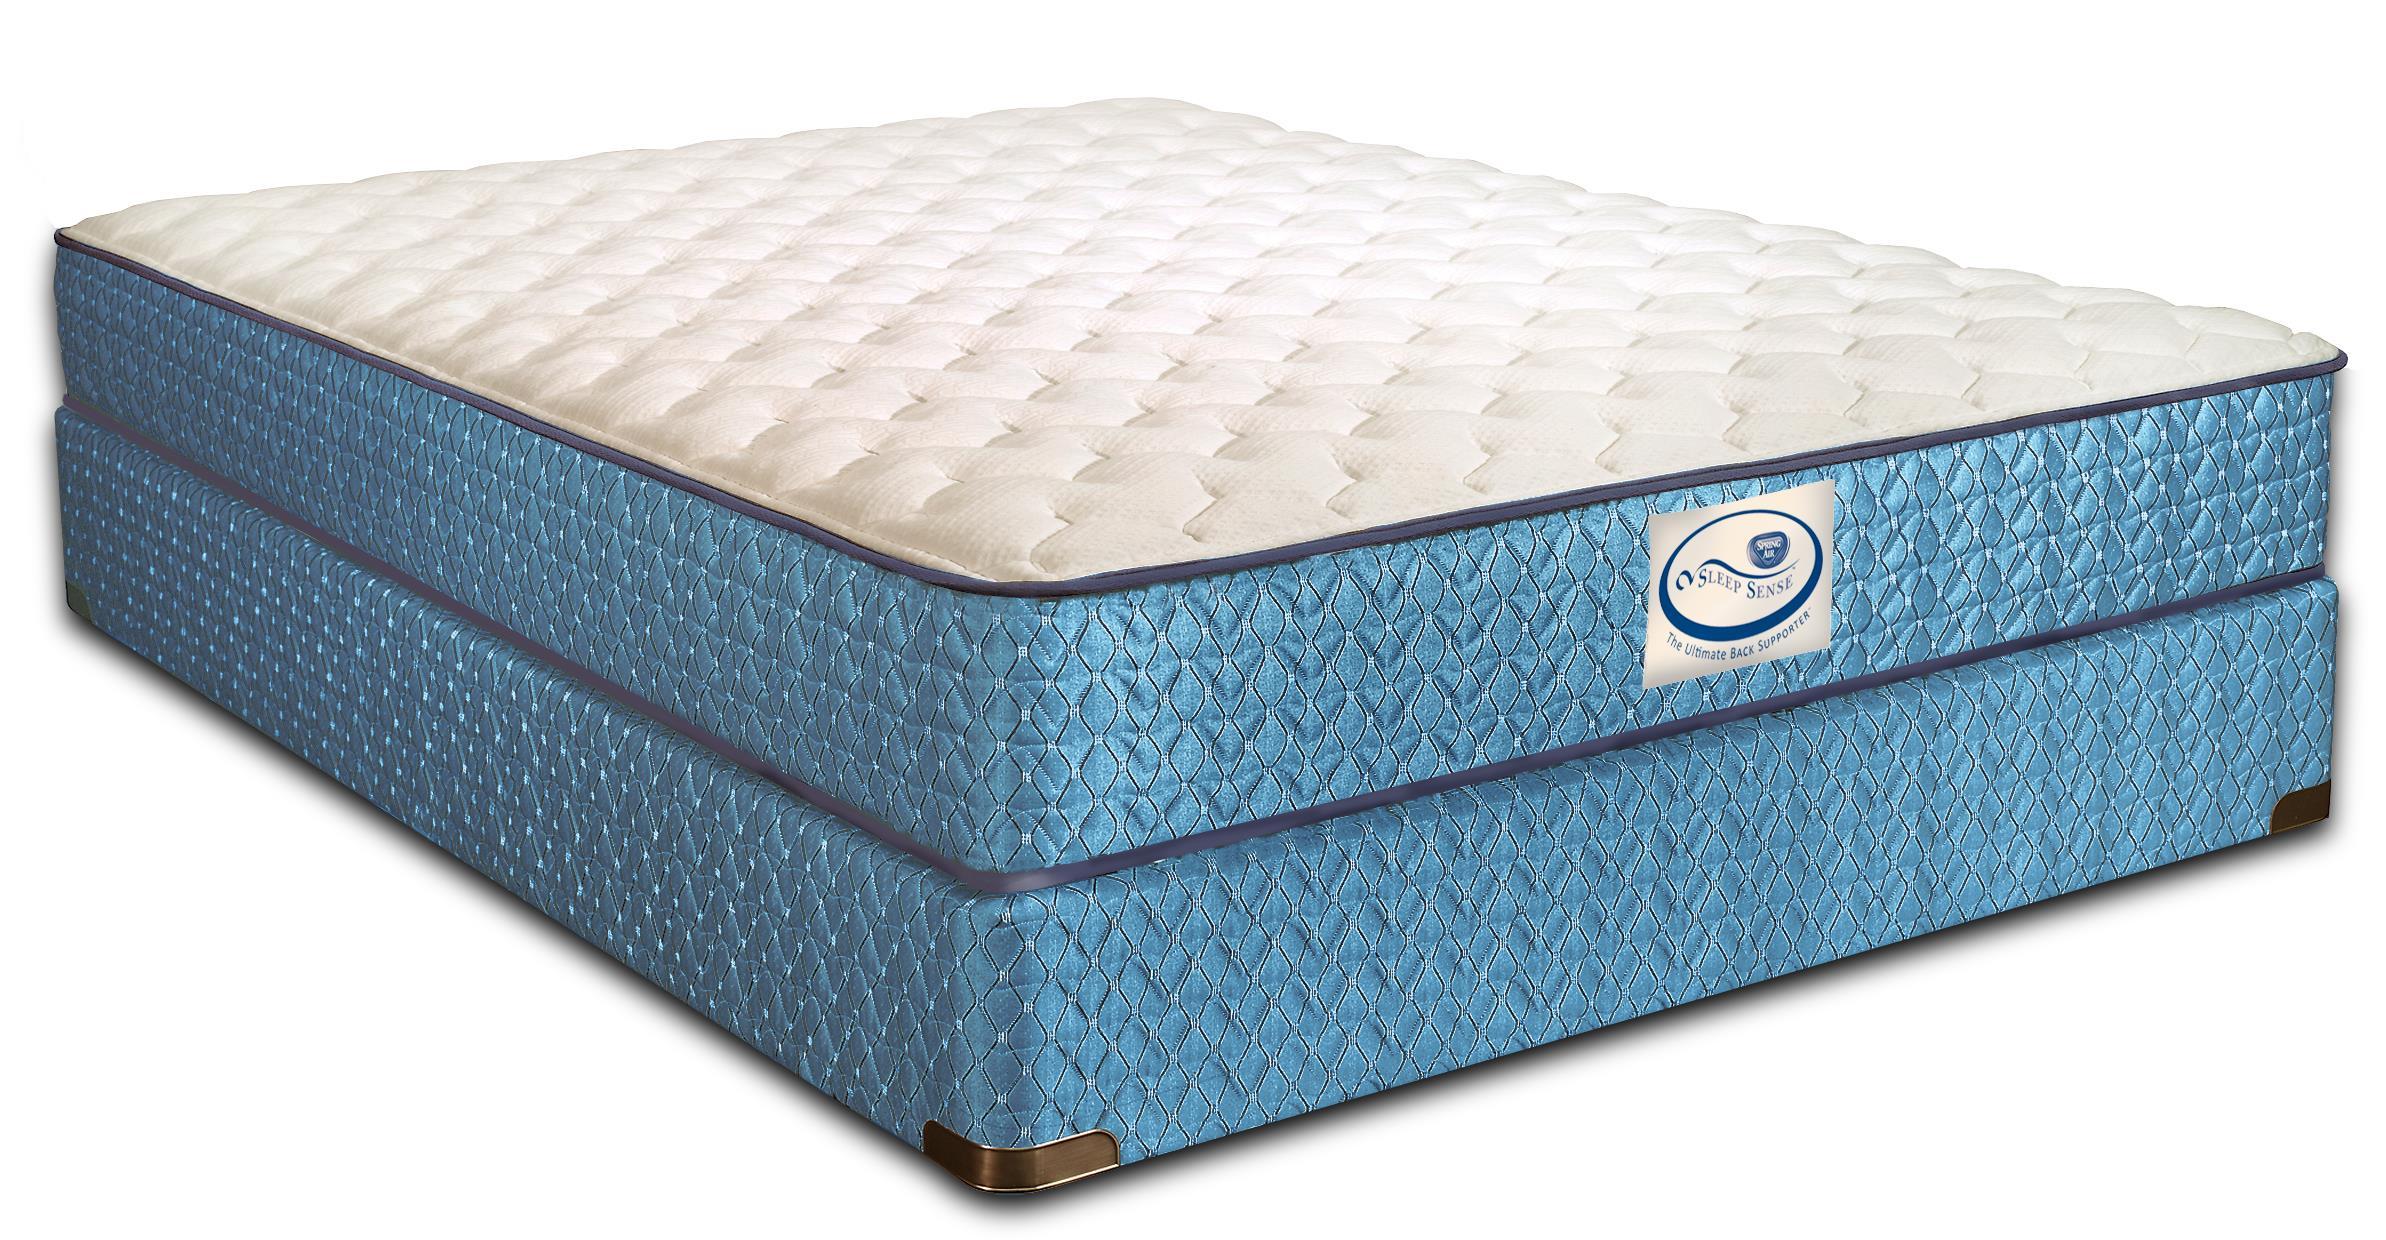 Sleep Sense King Firm Mattress Set by Spring Air at Mueller Furniture